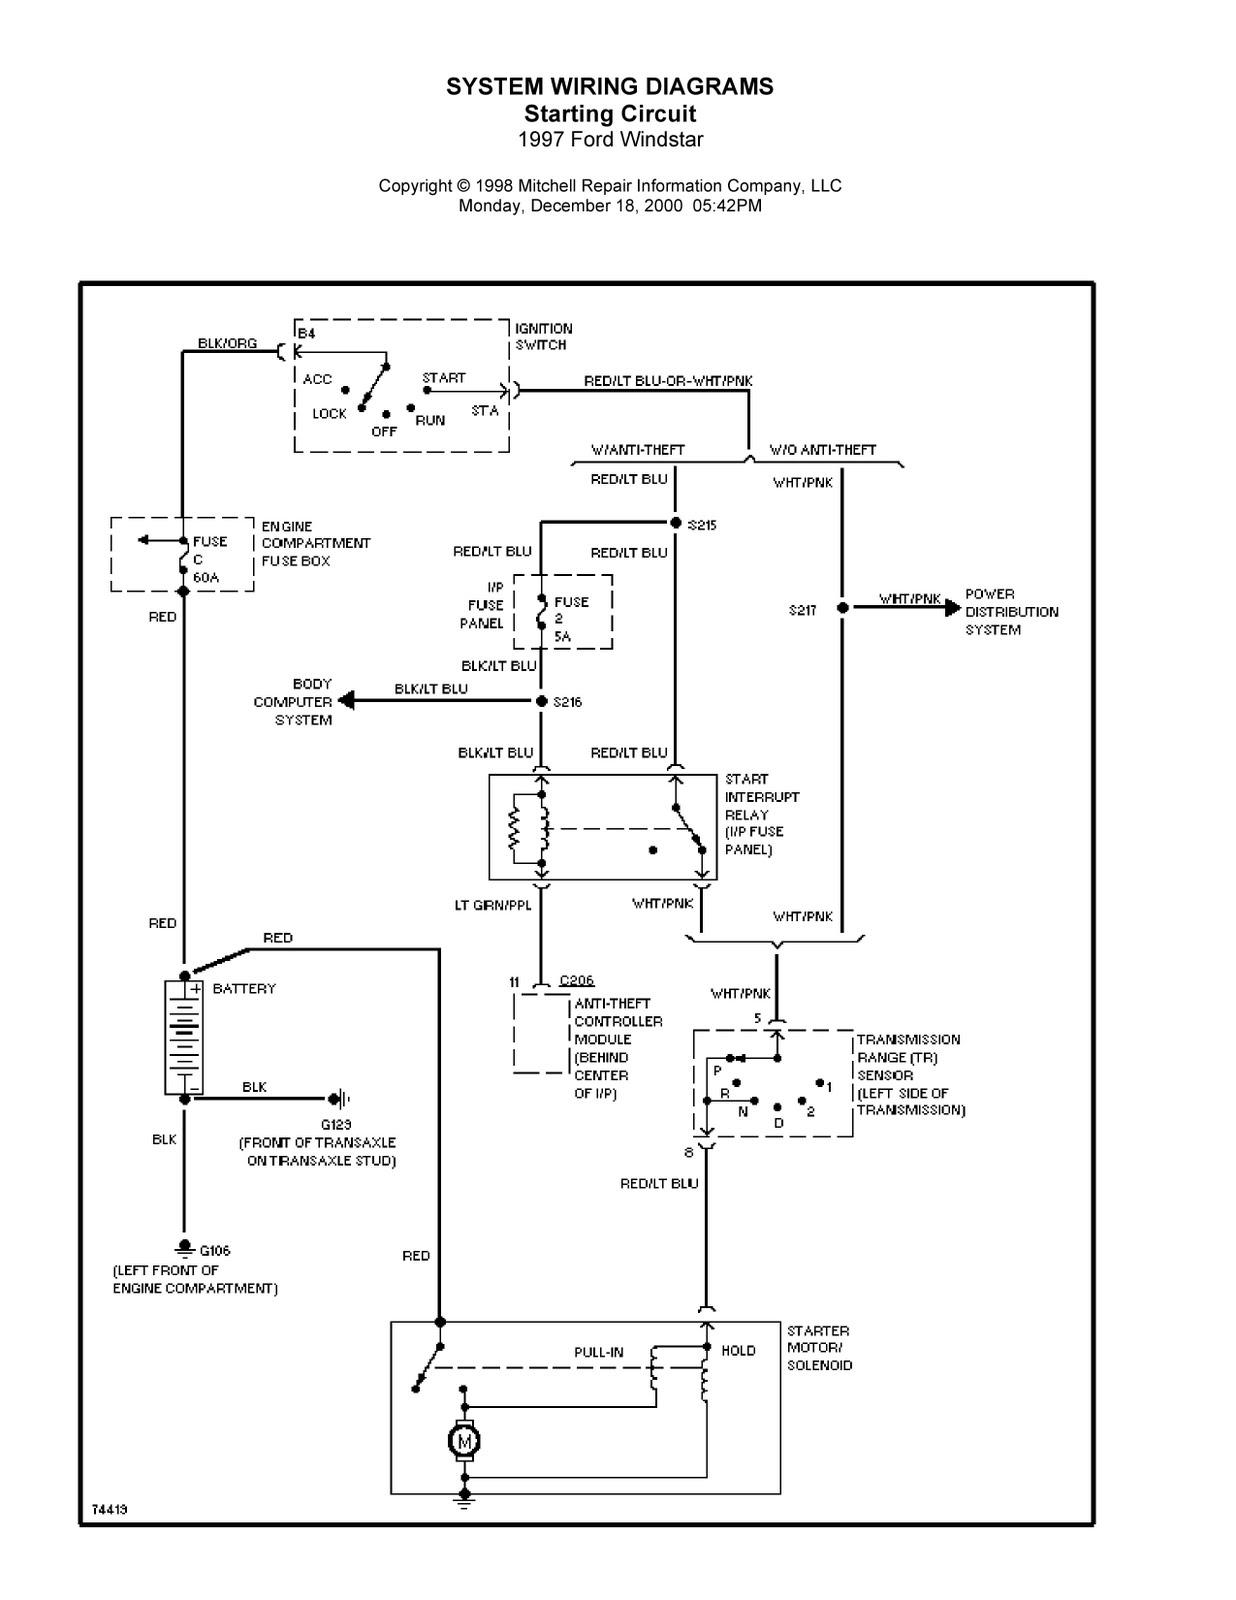 hight resolution of  ford windstar electrical diagram 1996 windstar starter runs in accessory run and start positions 0047 jpg 1996 windstar starter runs